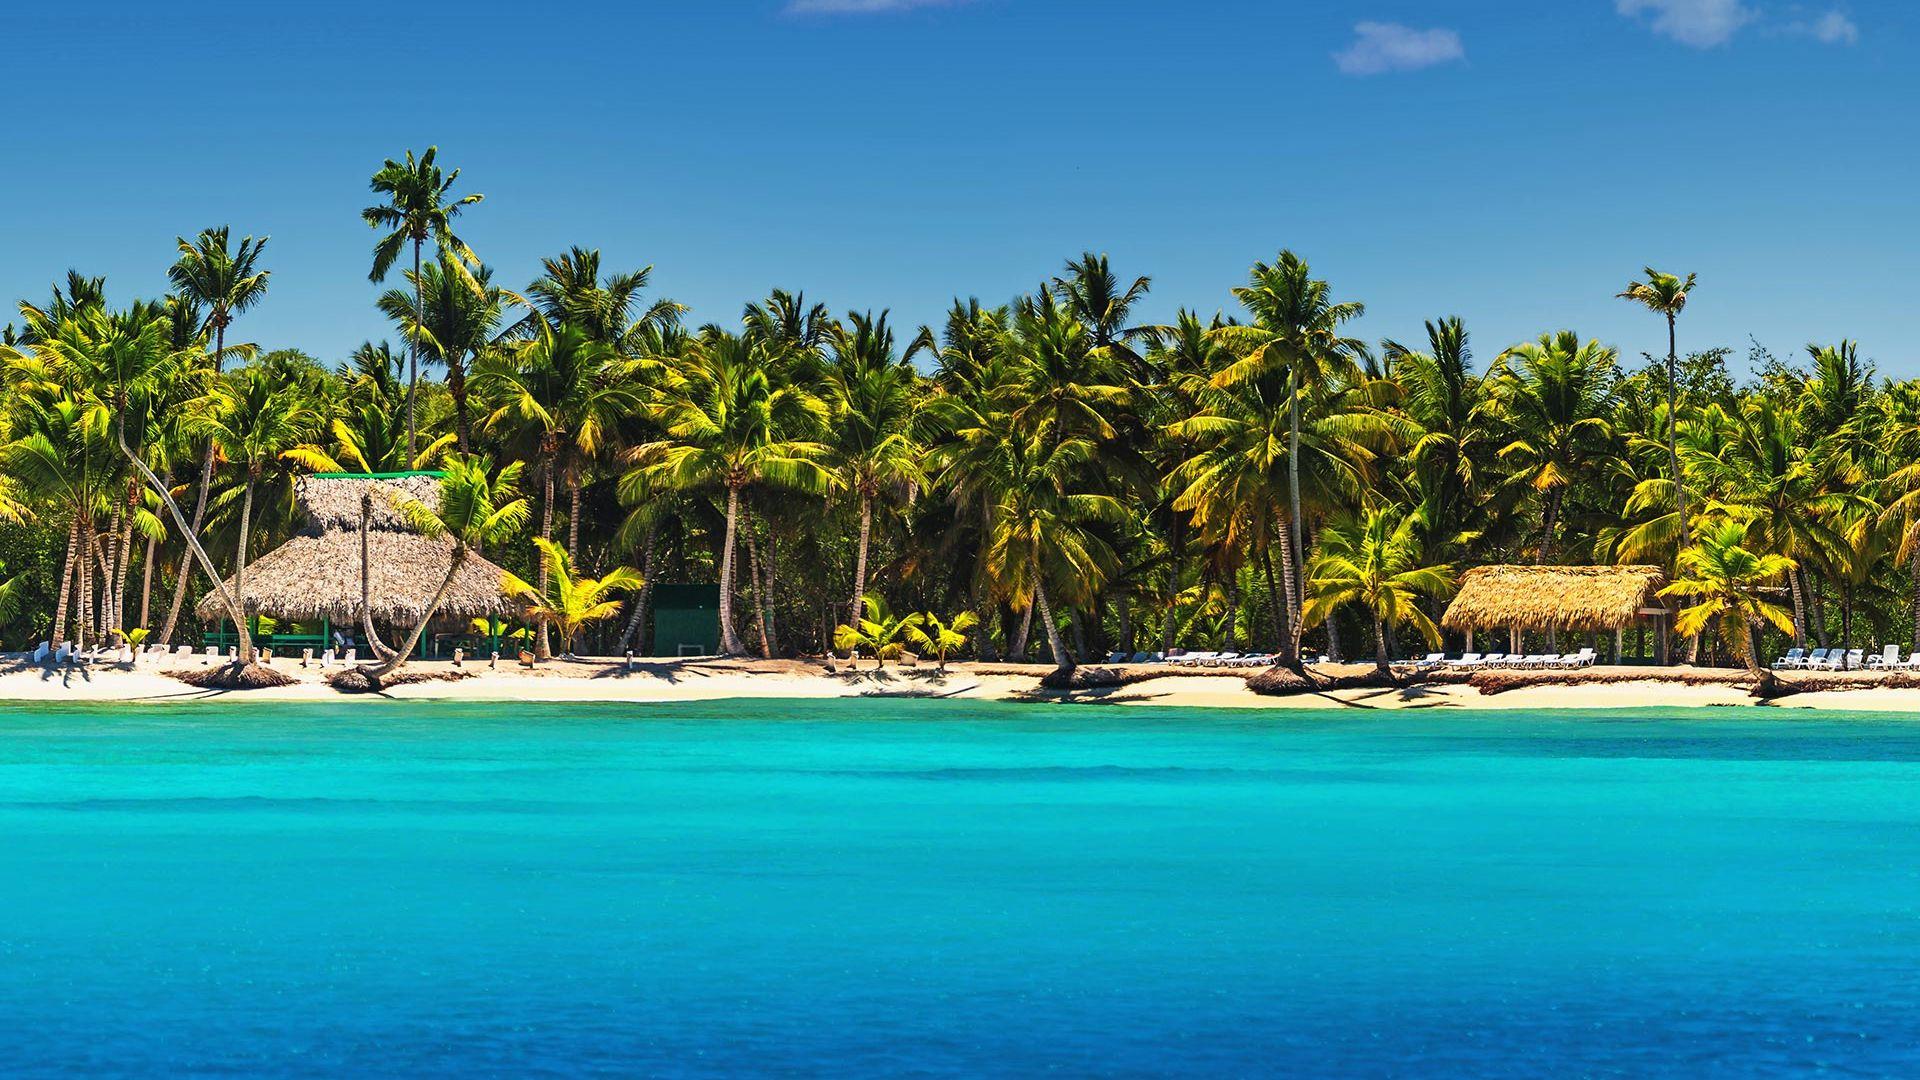 Sejur Plaja Punta Cana, Republica Dominicana, 12 zile - ianuarie 2022